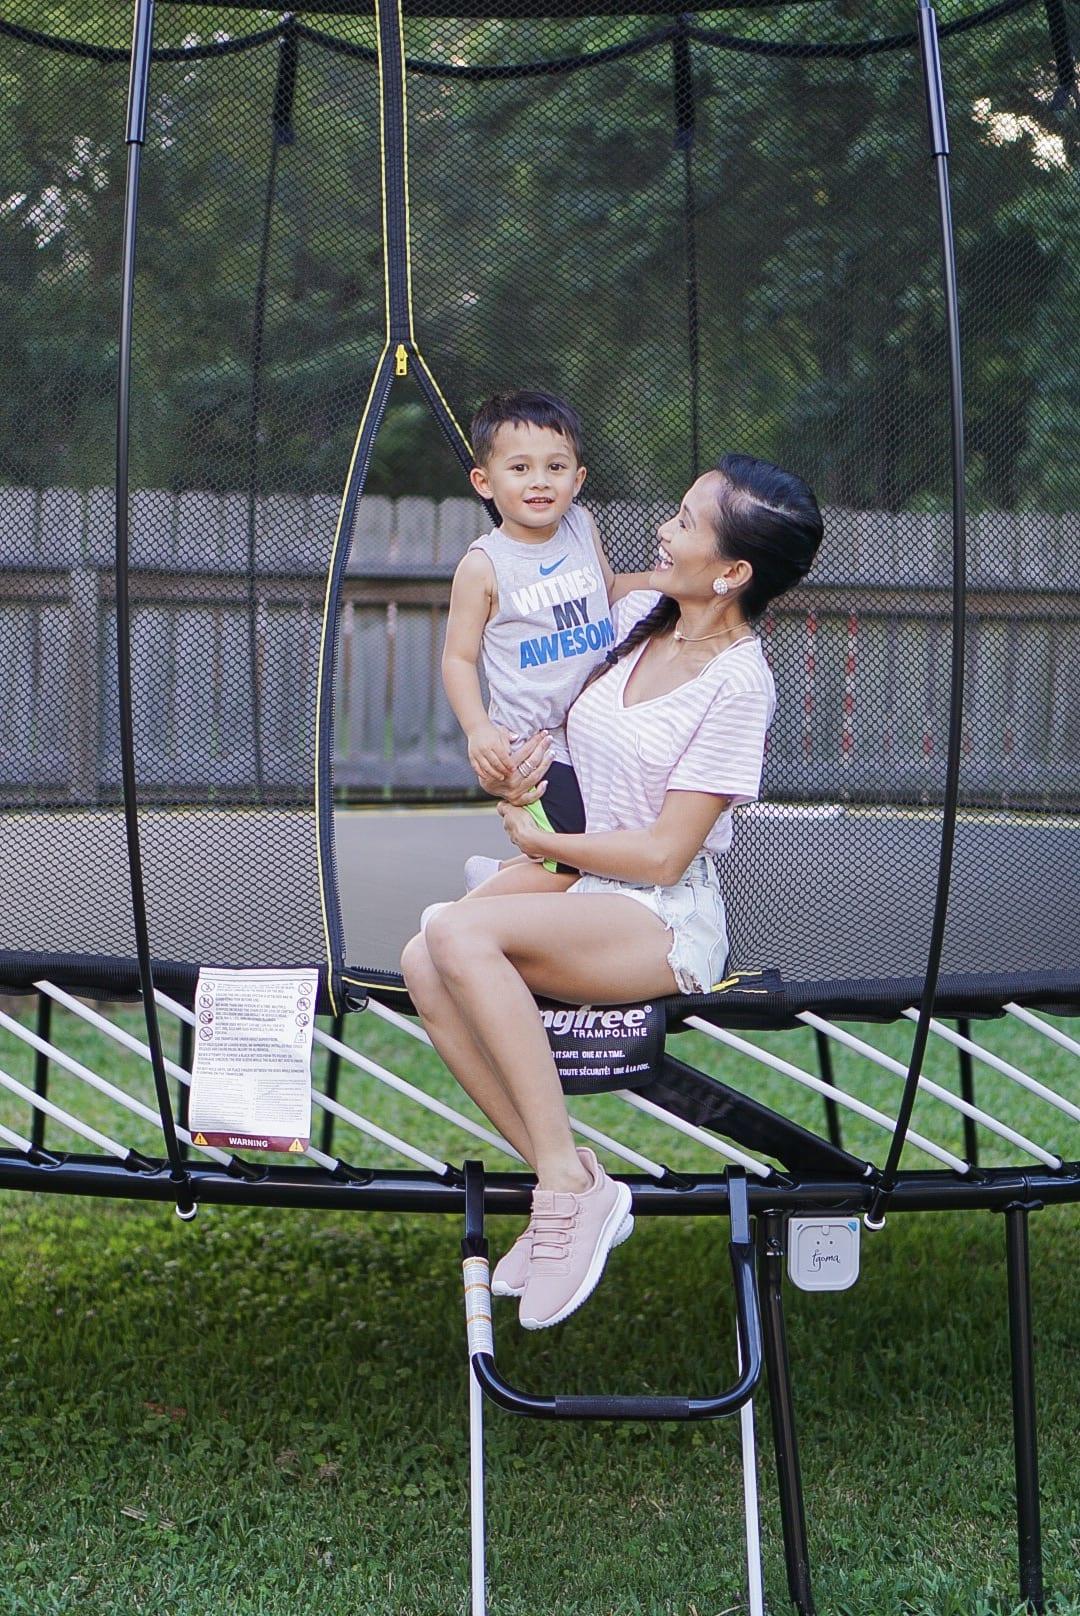 SPRINGREE TRAMPOLINE, backyard activities, toddler activities, summer activities, summer fun, trampoline safety